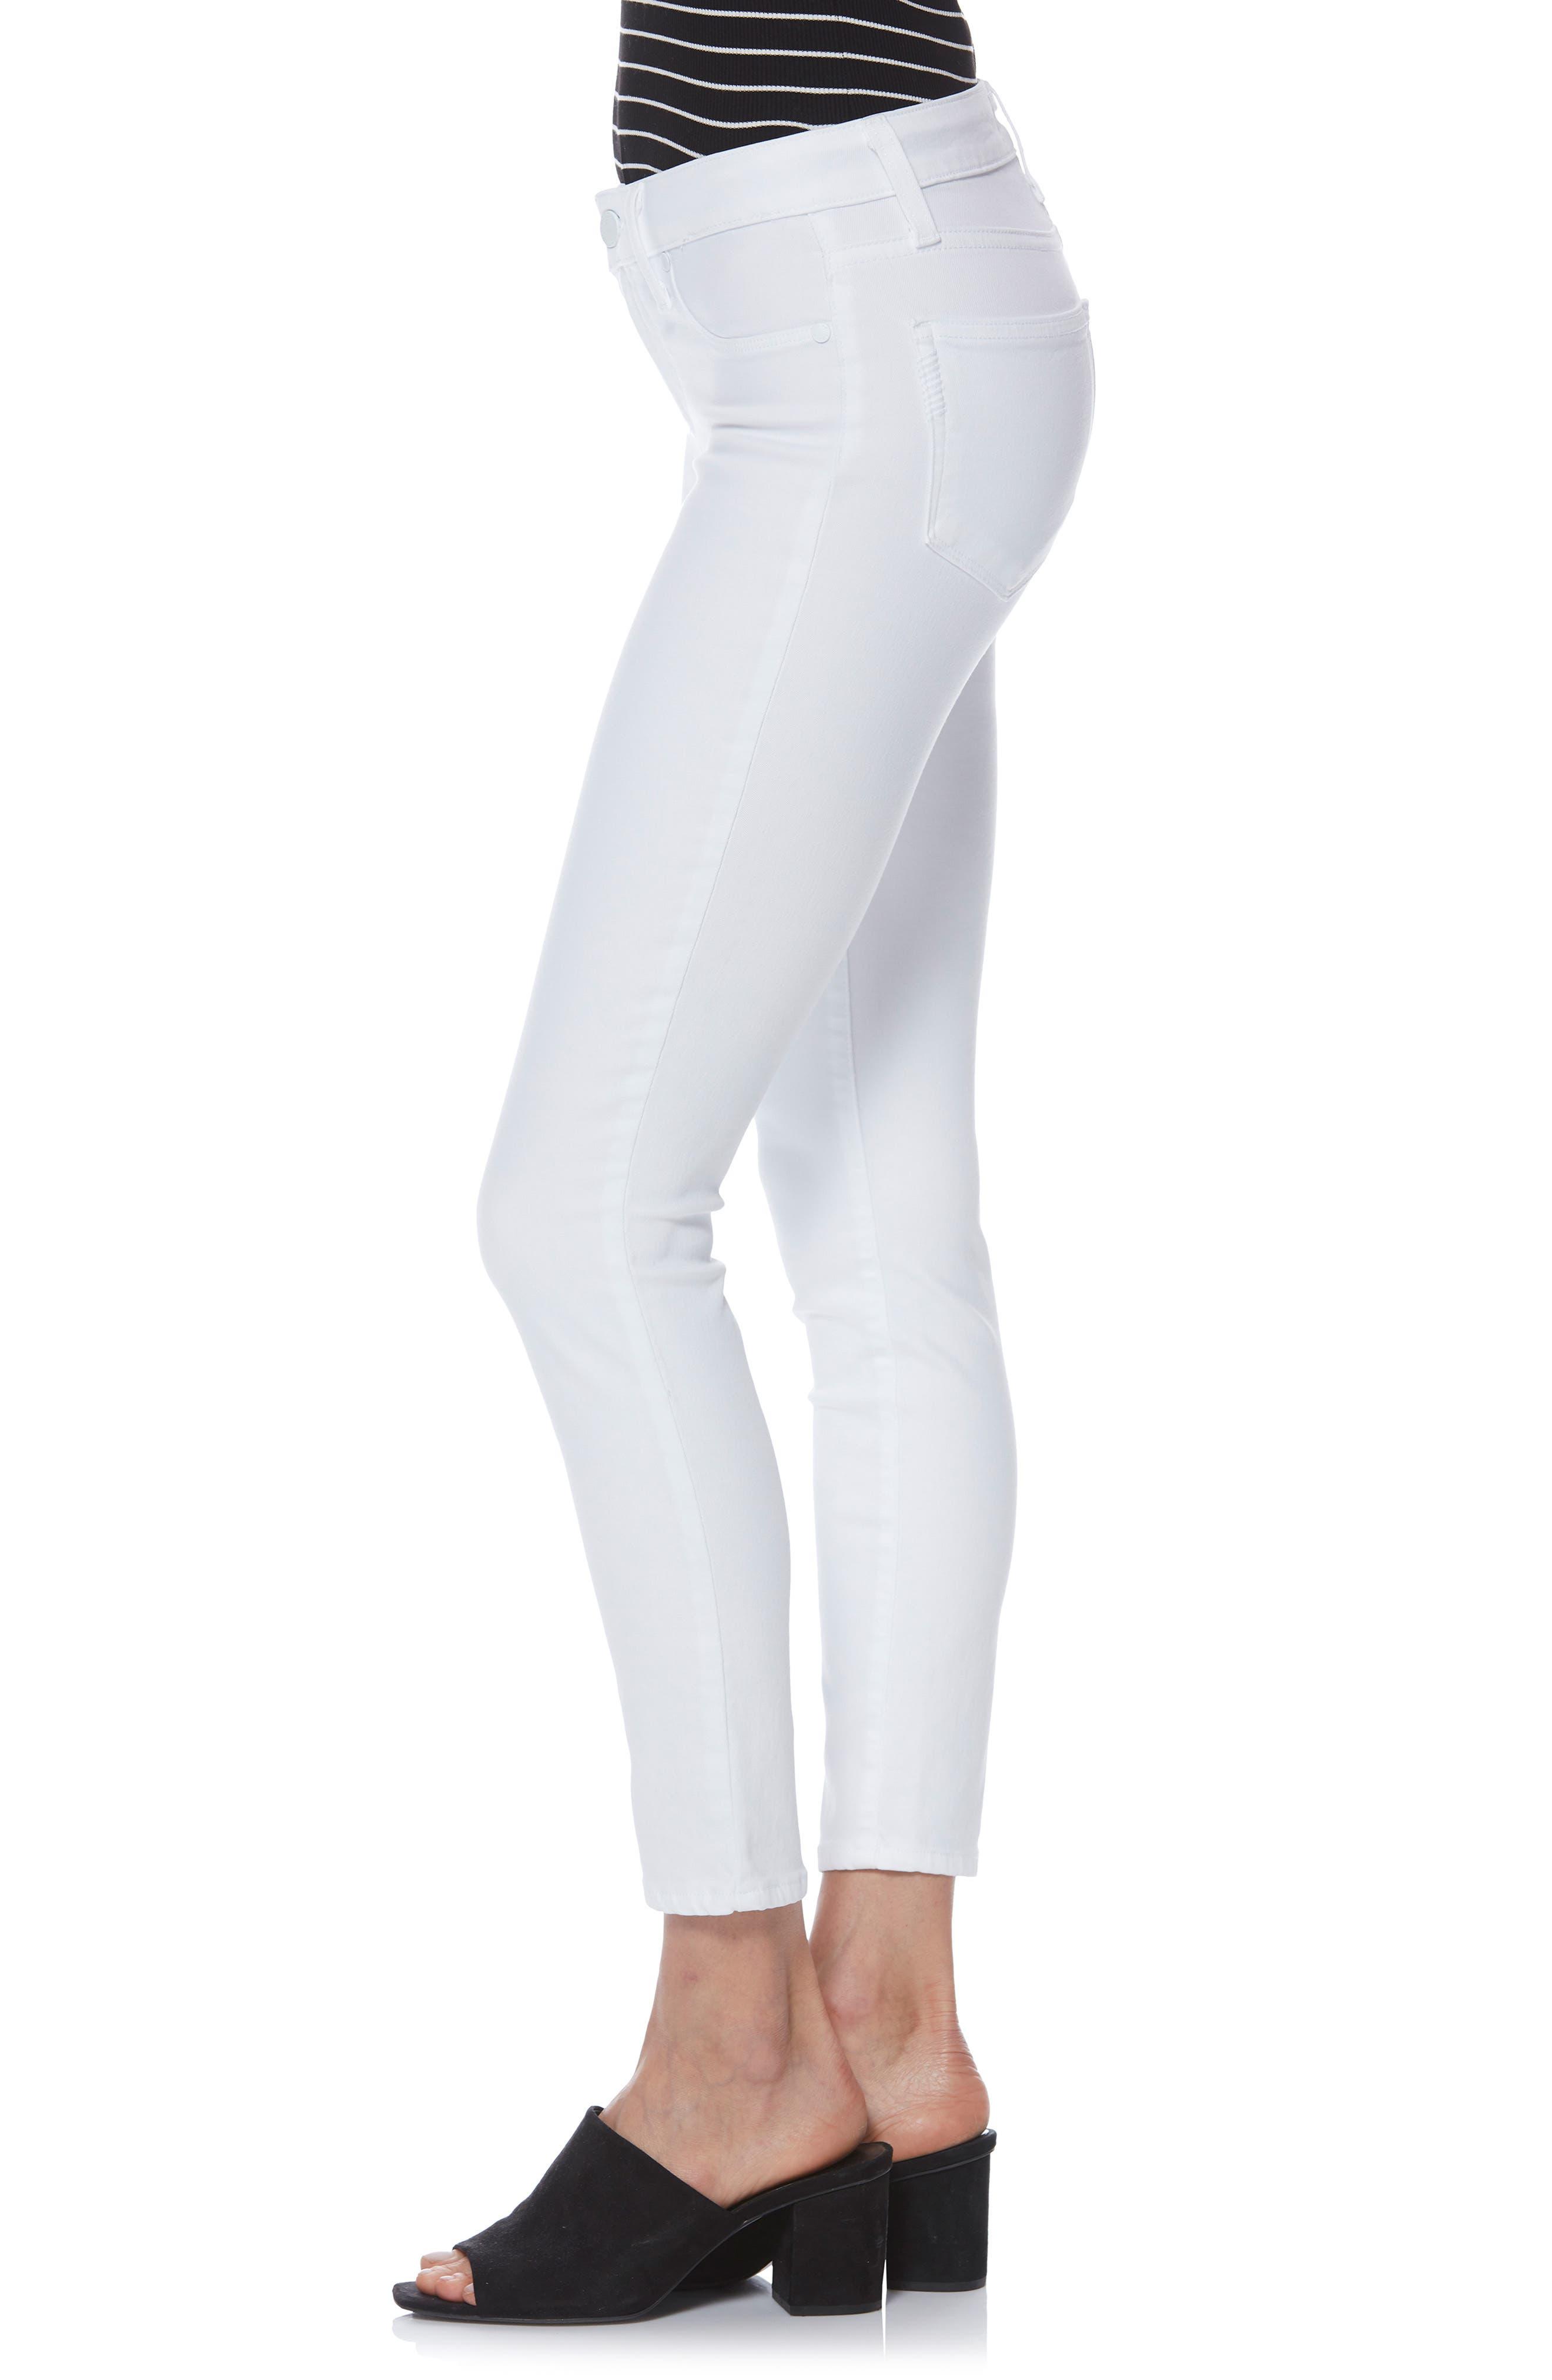 PAIGE,                             Verdugo Faux Pocket Crop Skinny Jeans,                             Alternate thumbnail 4, color,                             VIVID WHITE